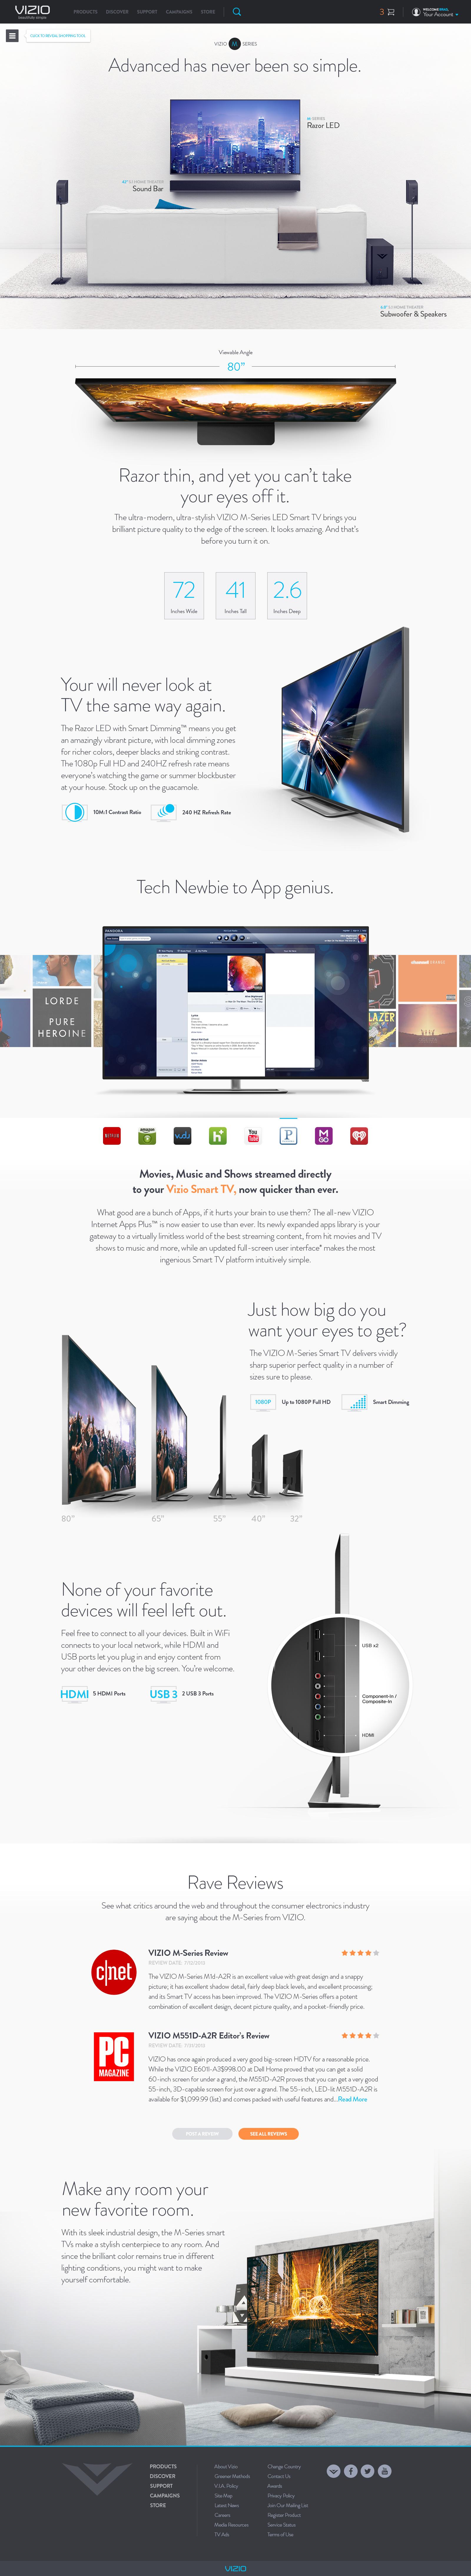 Vizio Site Redesign Pitch Modern Web Design Web Layout Design Webpage Design